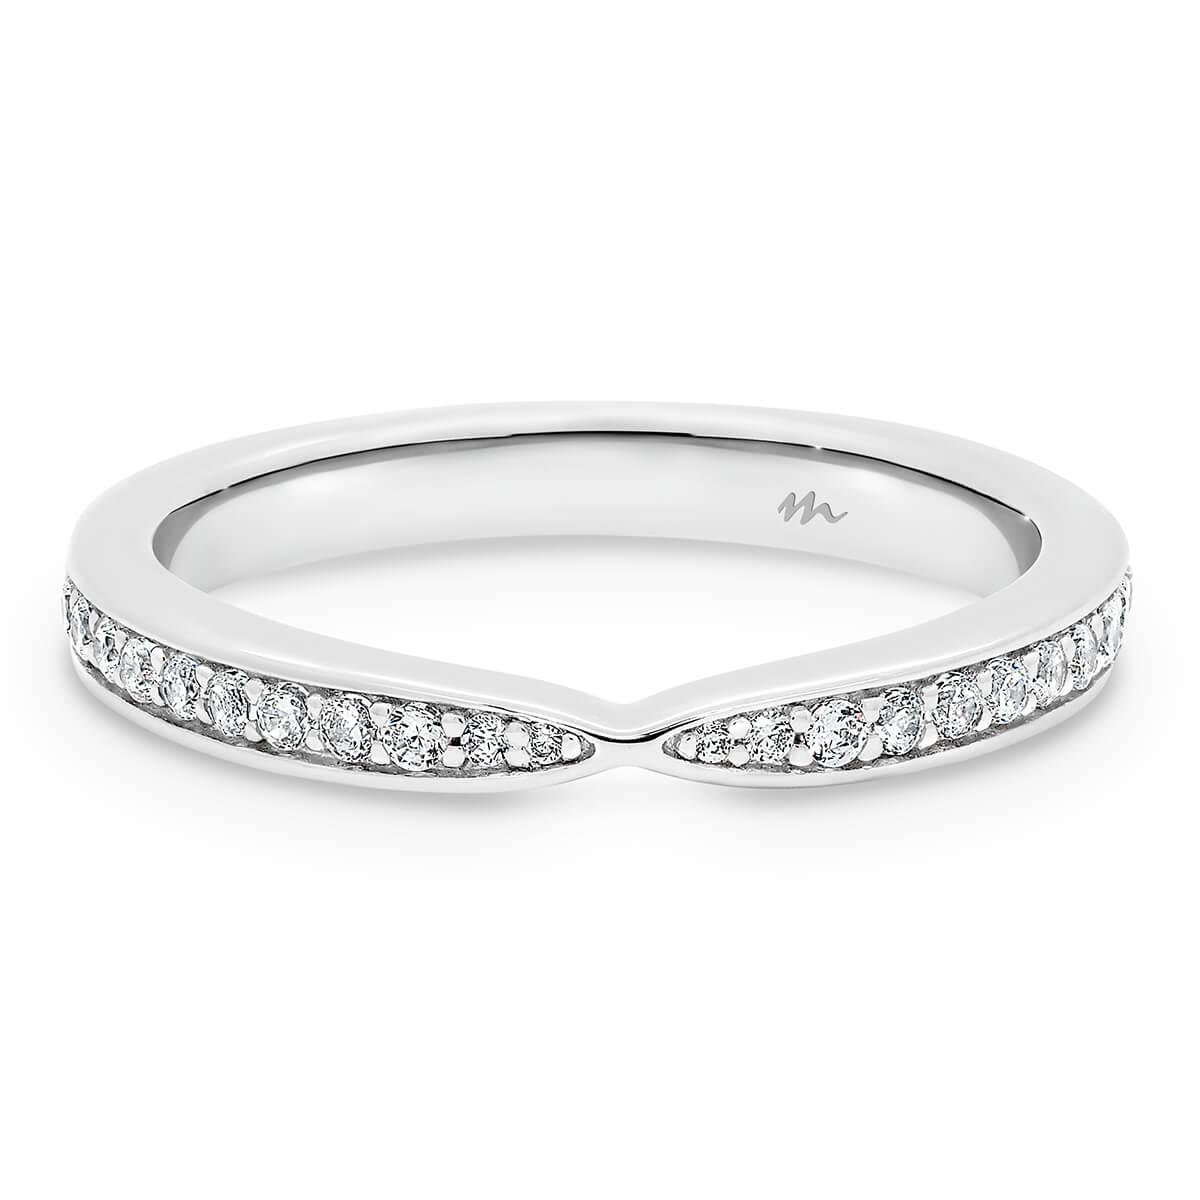 Marie pave set wedding ring